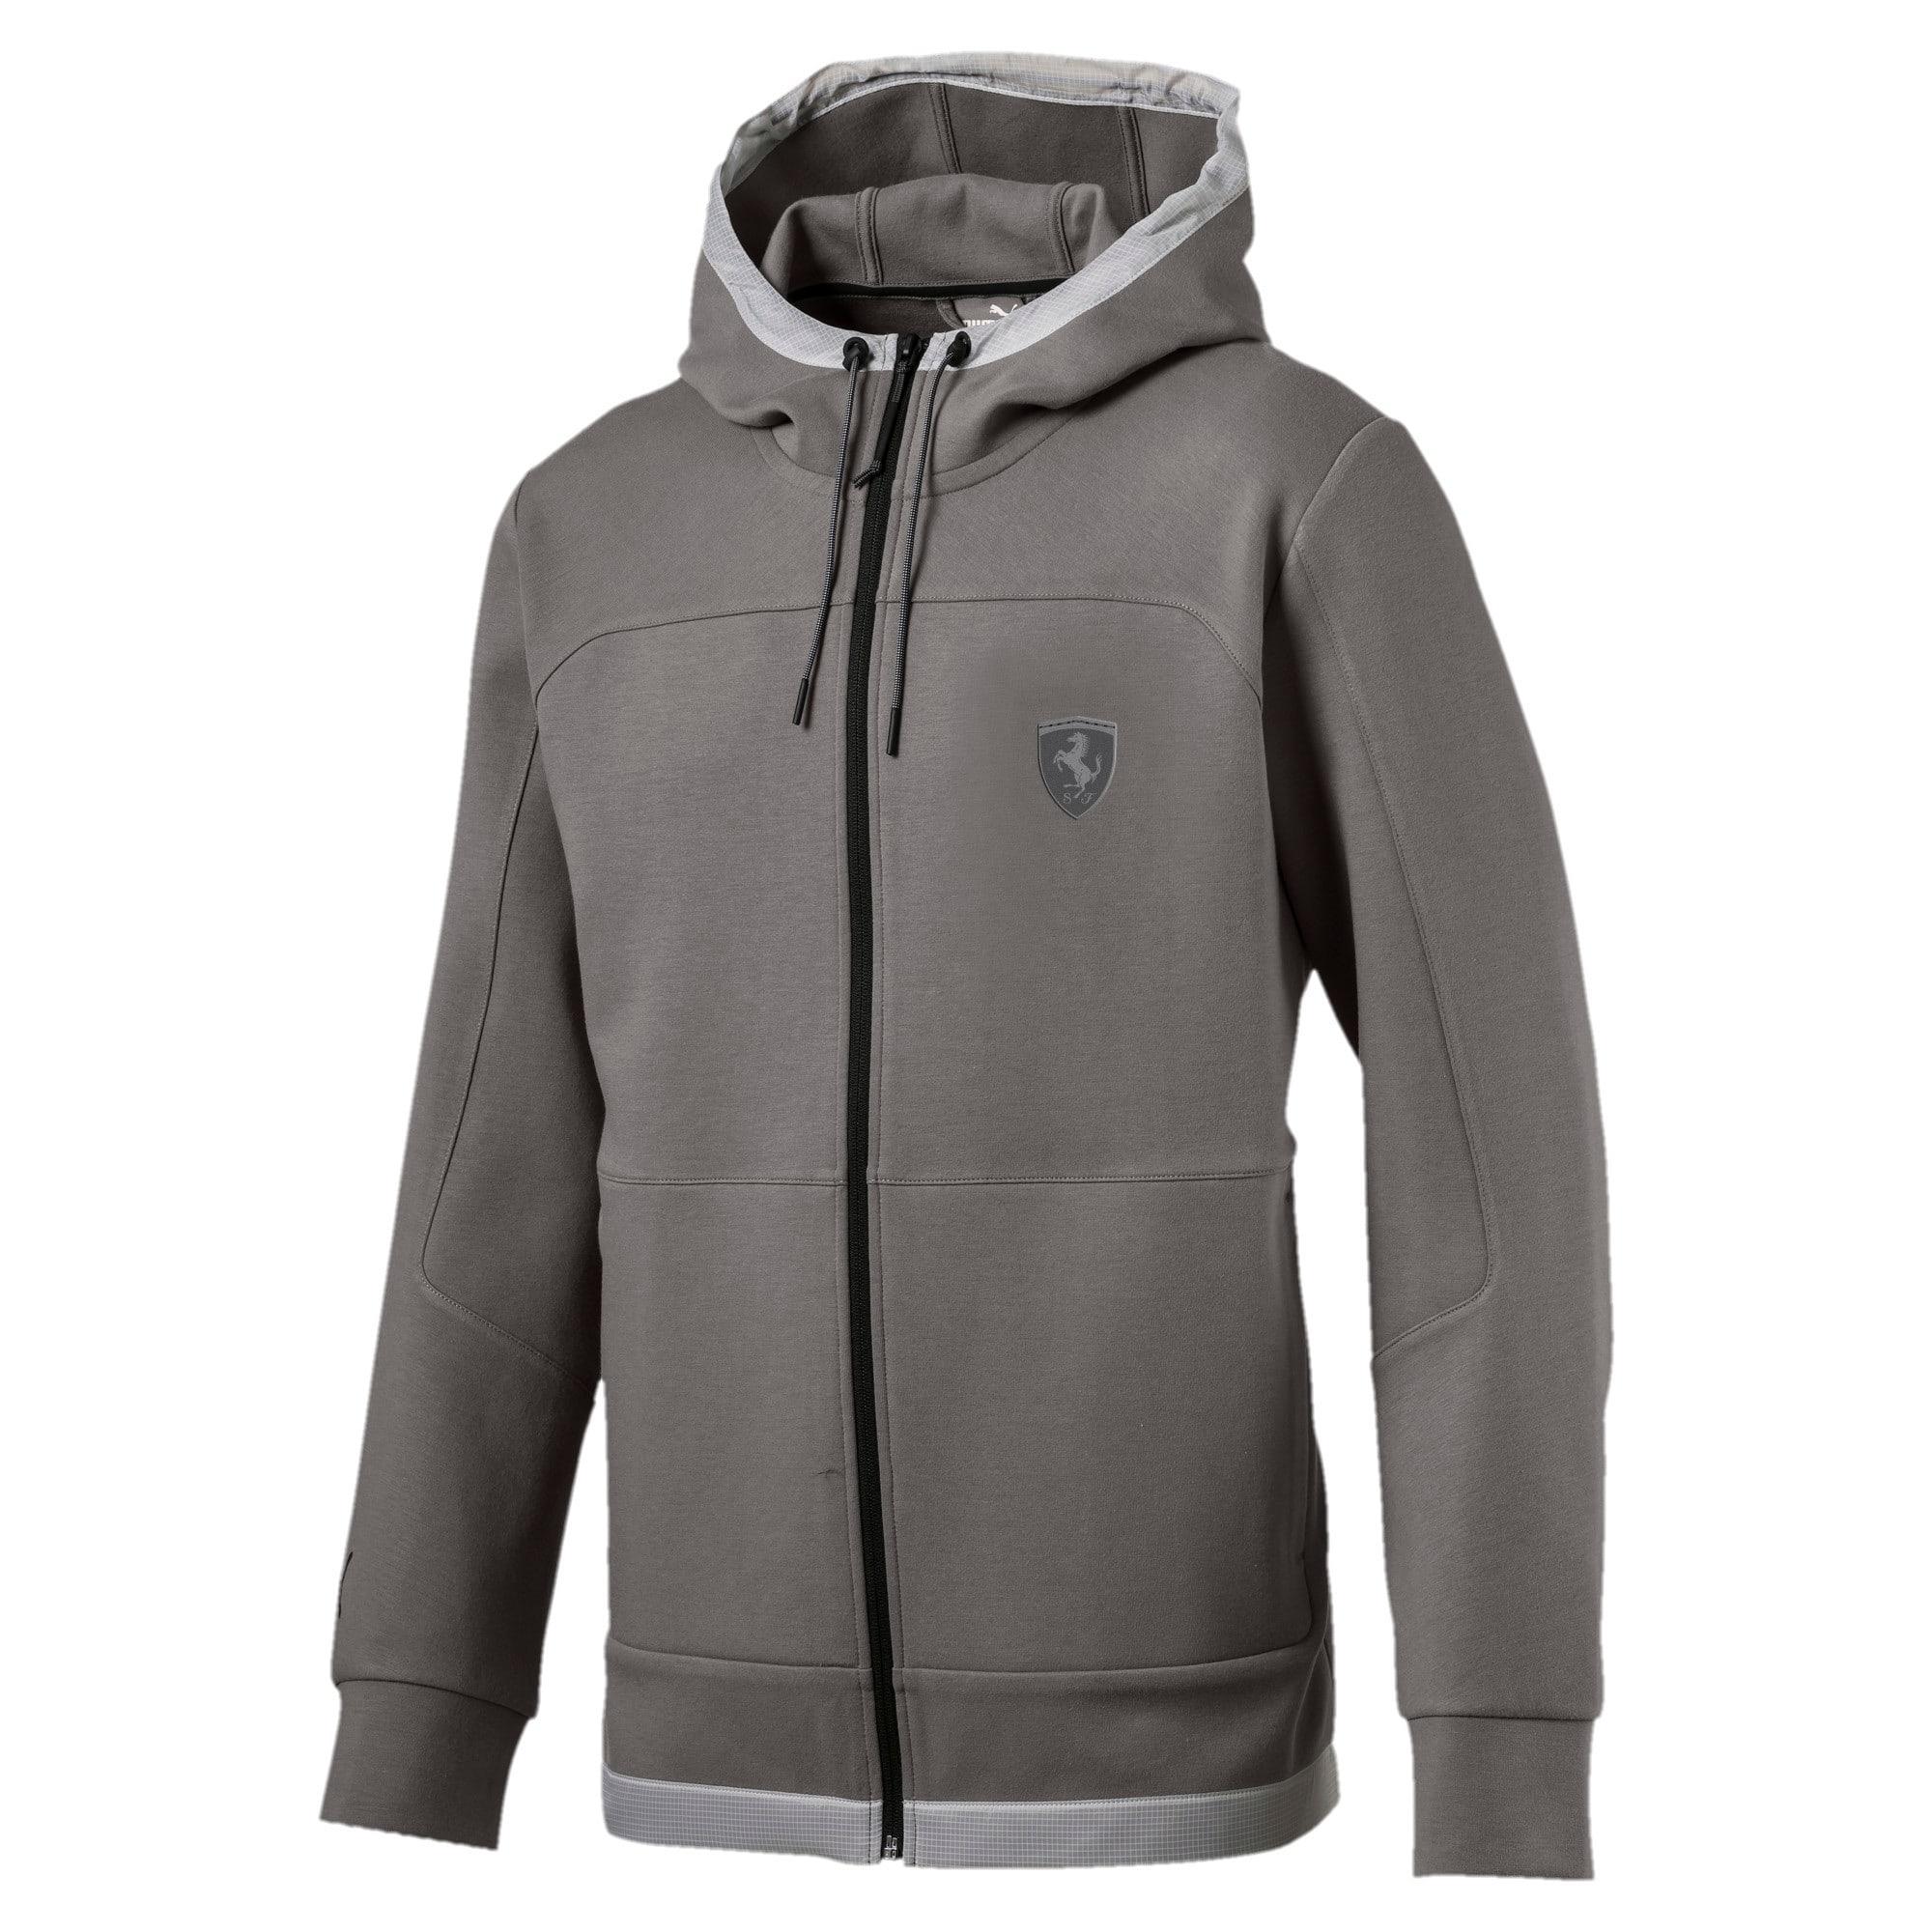 Thumbnail 1 of Scuderia Ferrari Men's Hooded Sweat Jacket, Charcoal Gray, medium